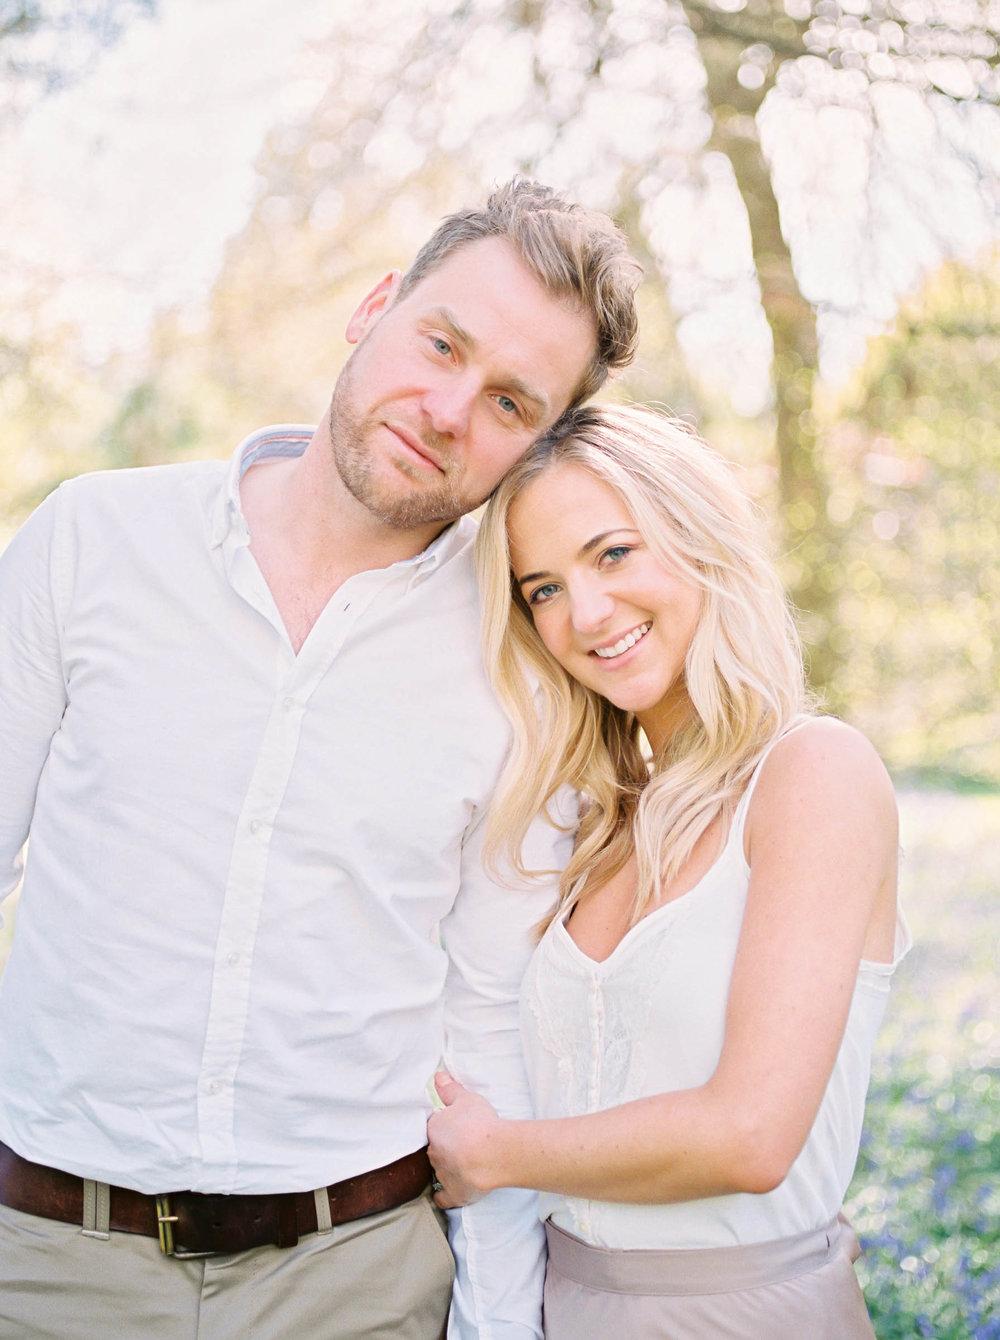 Amy O'Boyle Photography- Destination & UK Fine Art Film Wedding Photographer- Sheffield Park Garden National Trust Spring Engagement Shoot-15.jpg